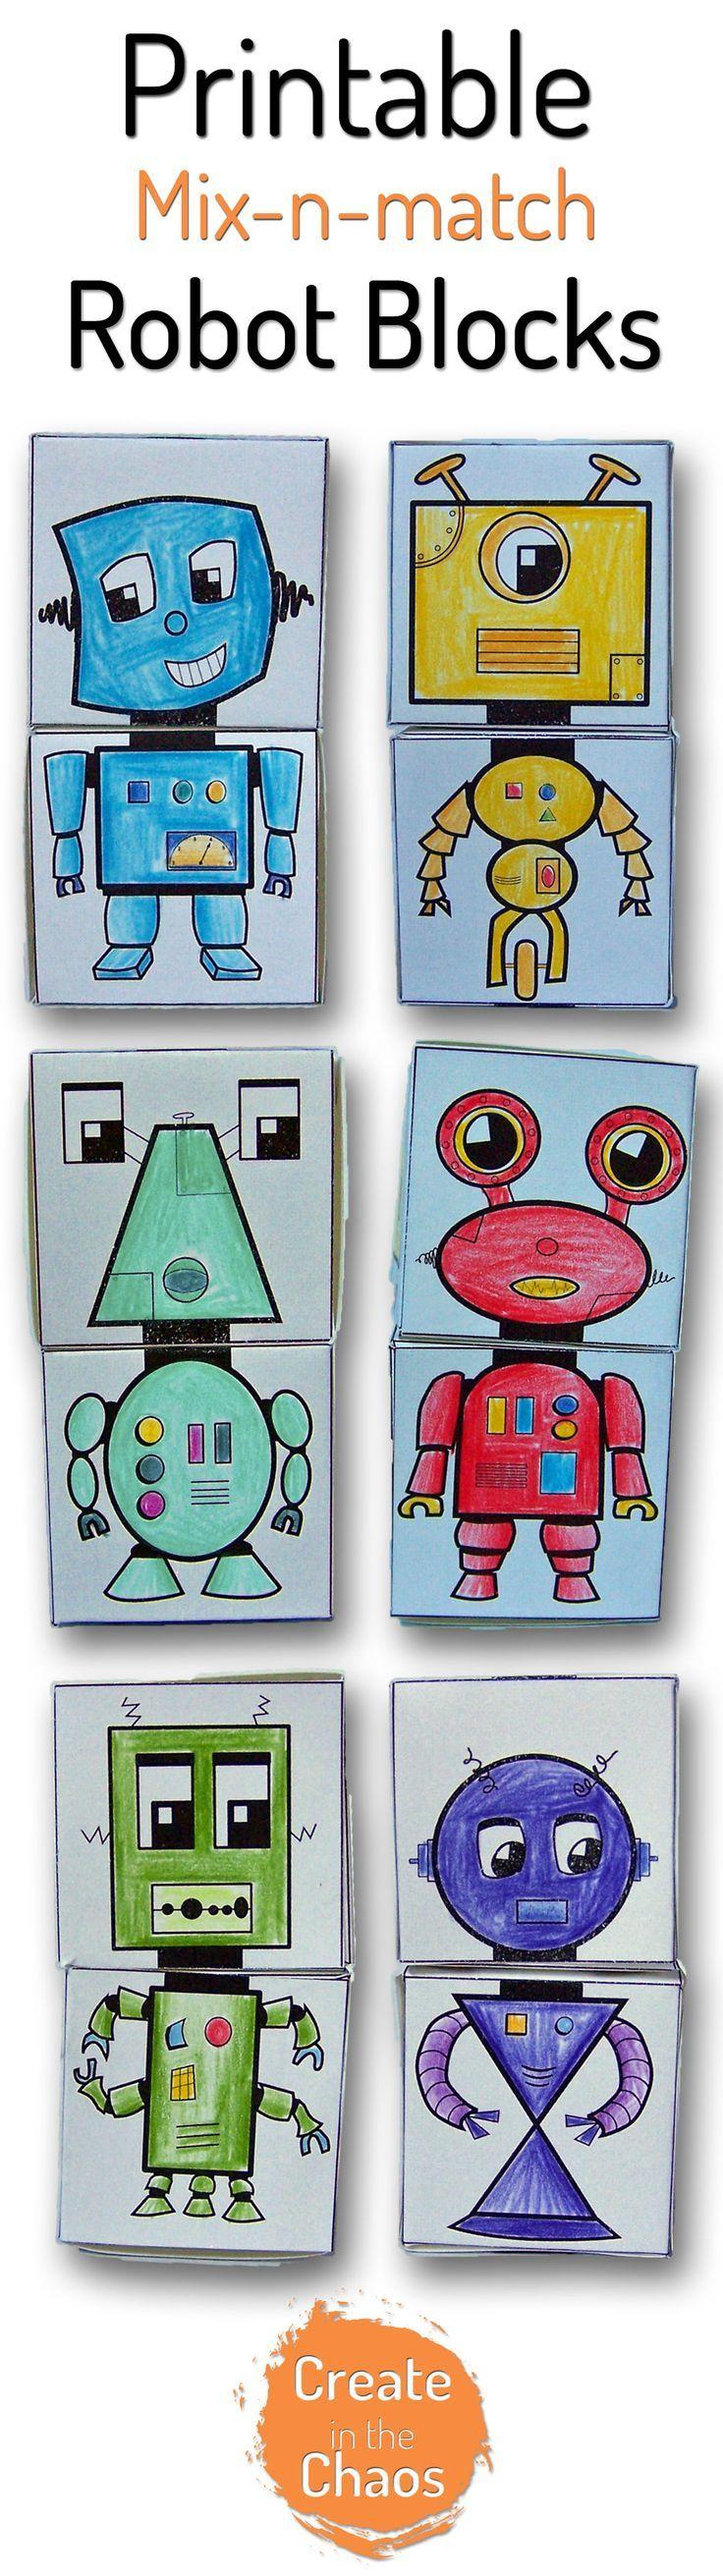 Printable mix-n-match robot blocks www.createinthechaos.com